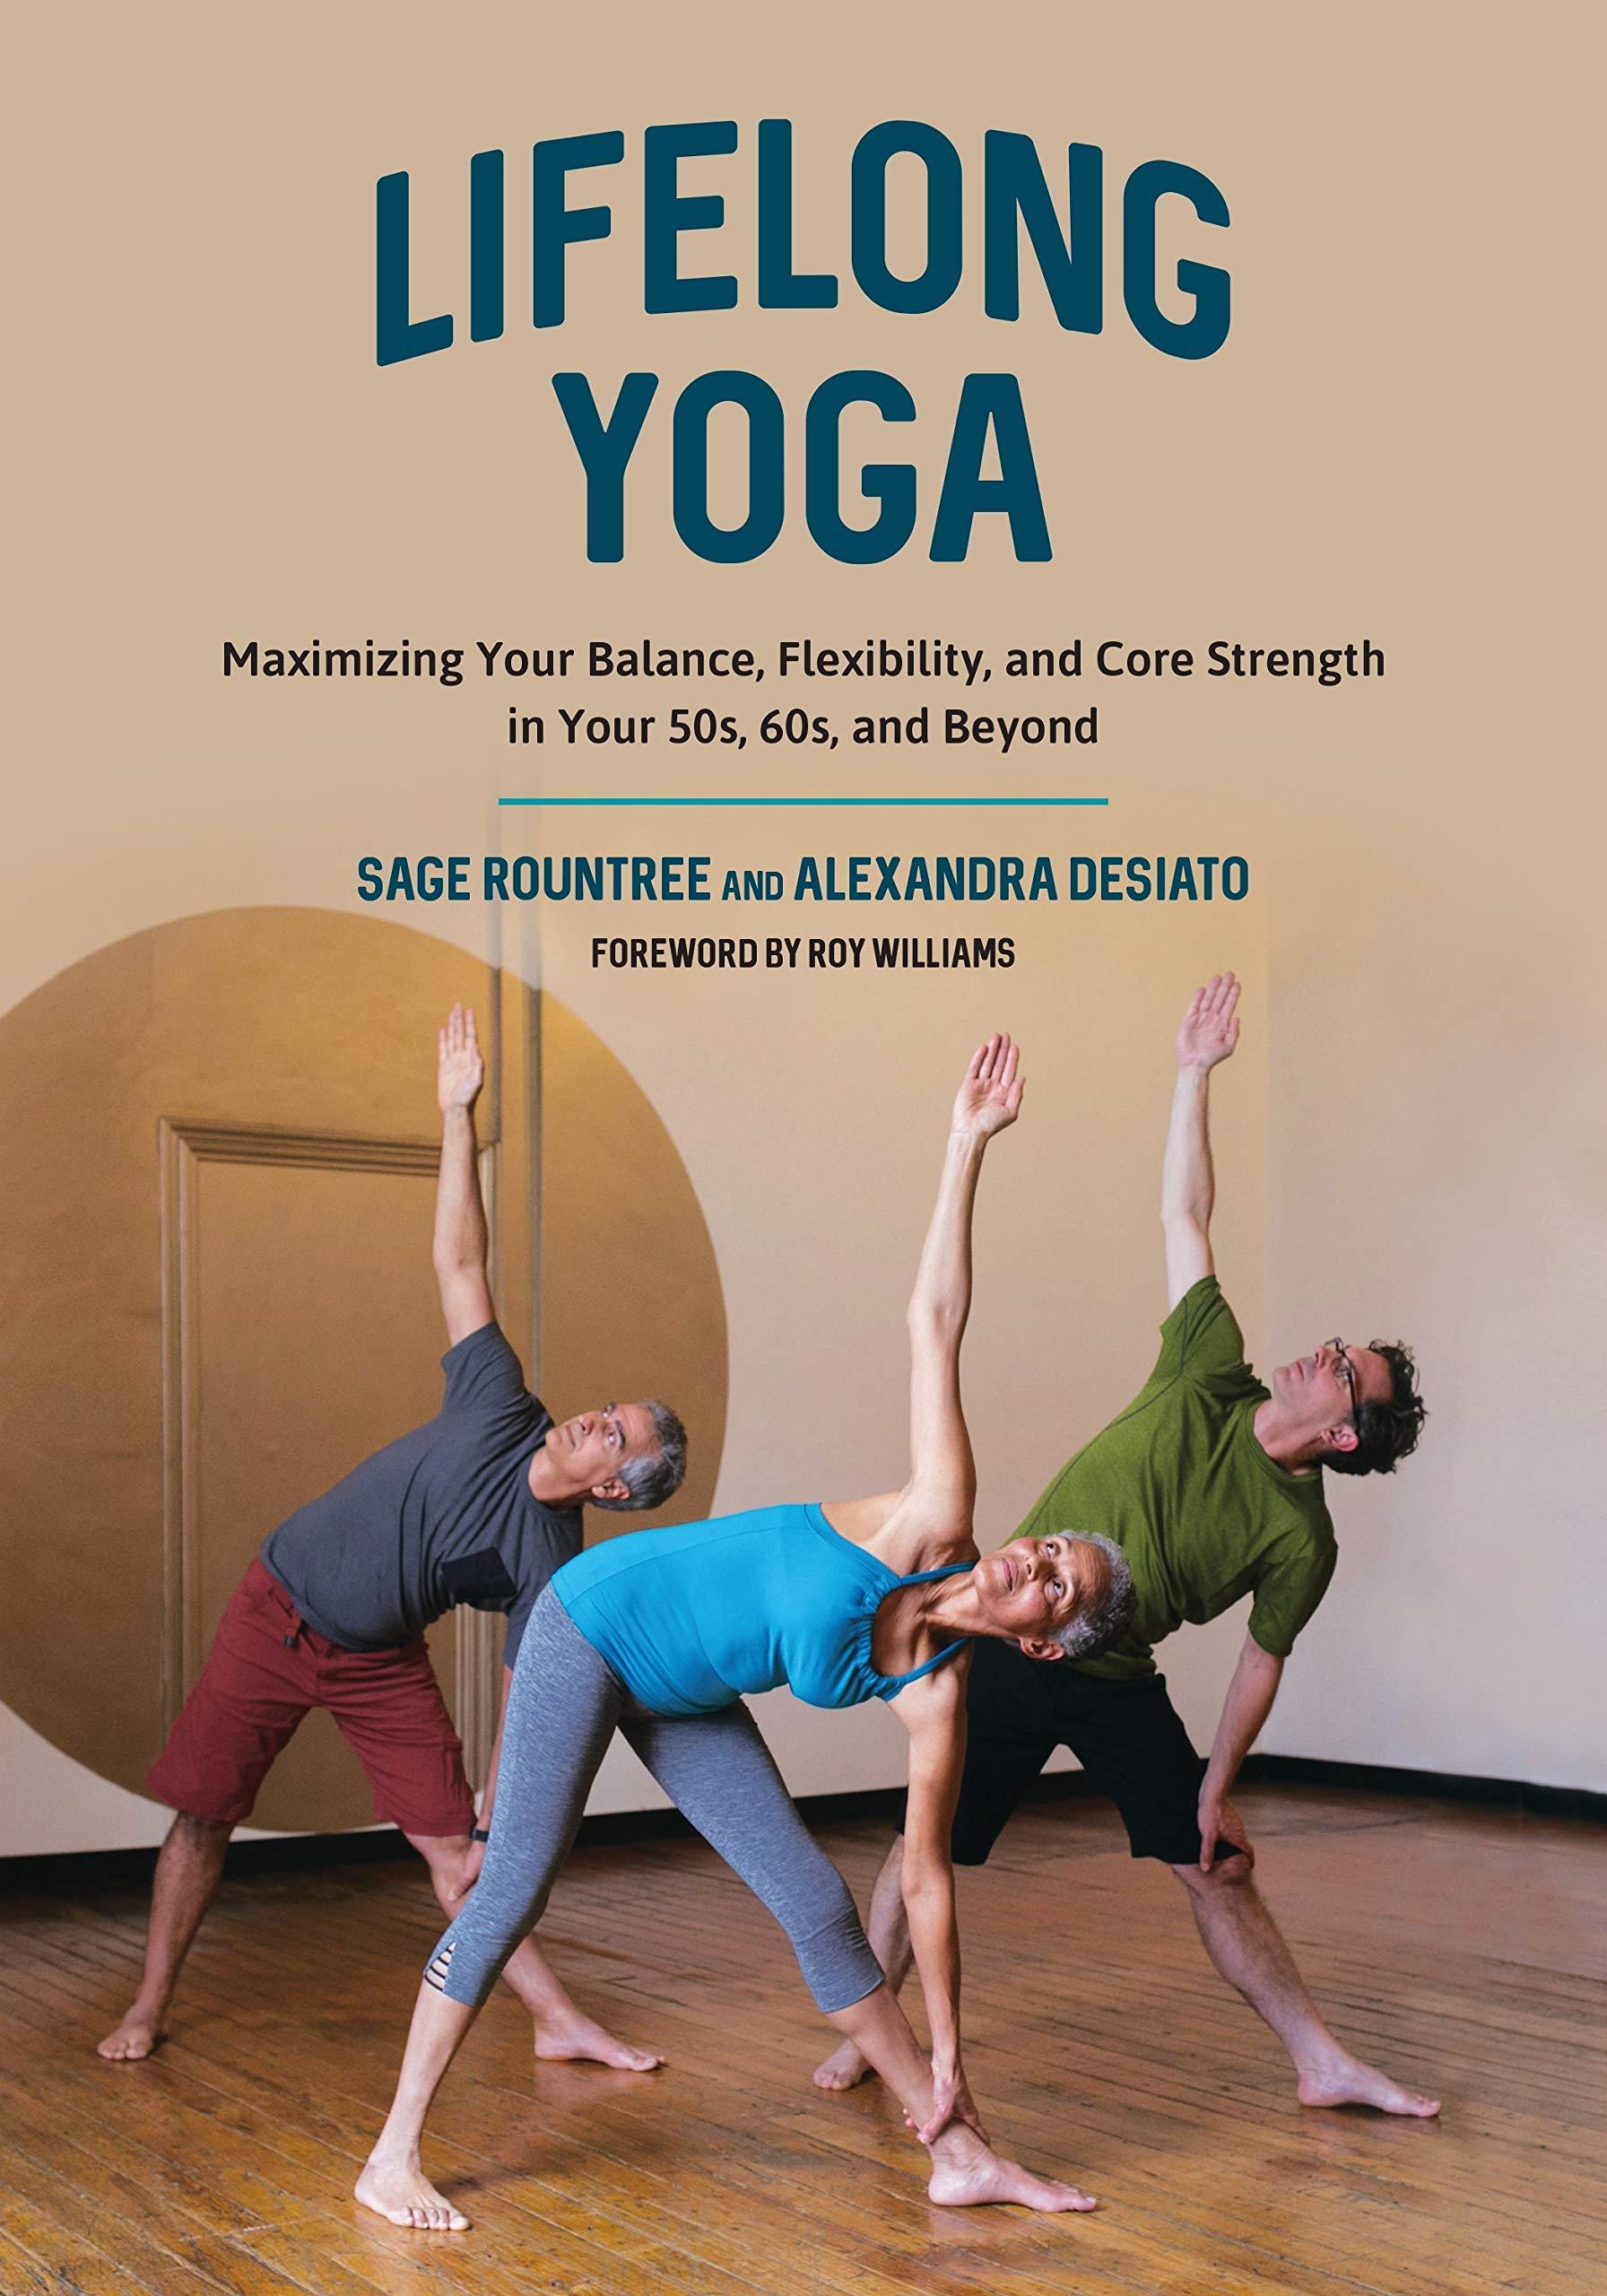 Lifelong Yoga: Maximizing Your Balance, Flexibility, and Core